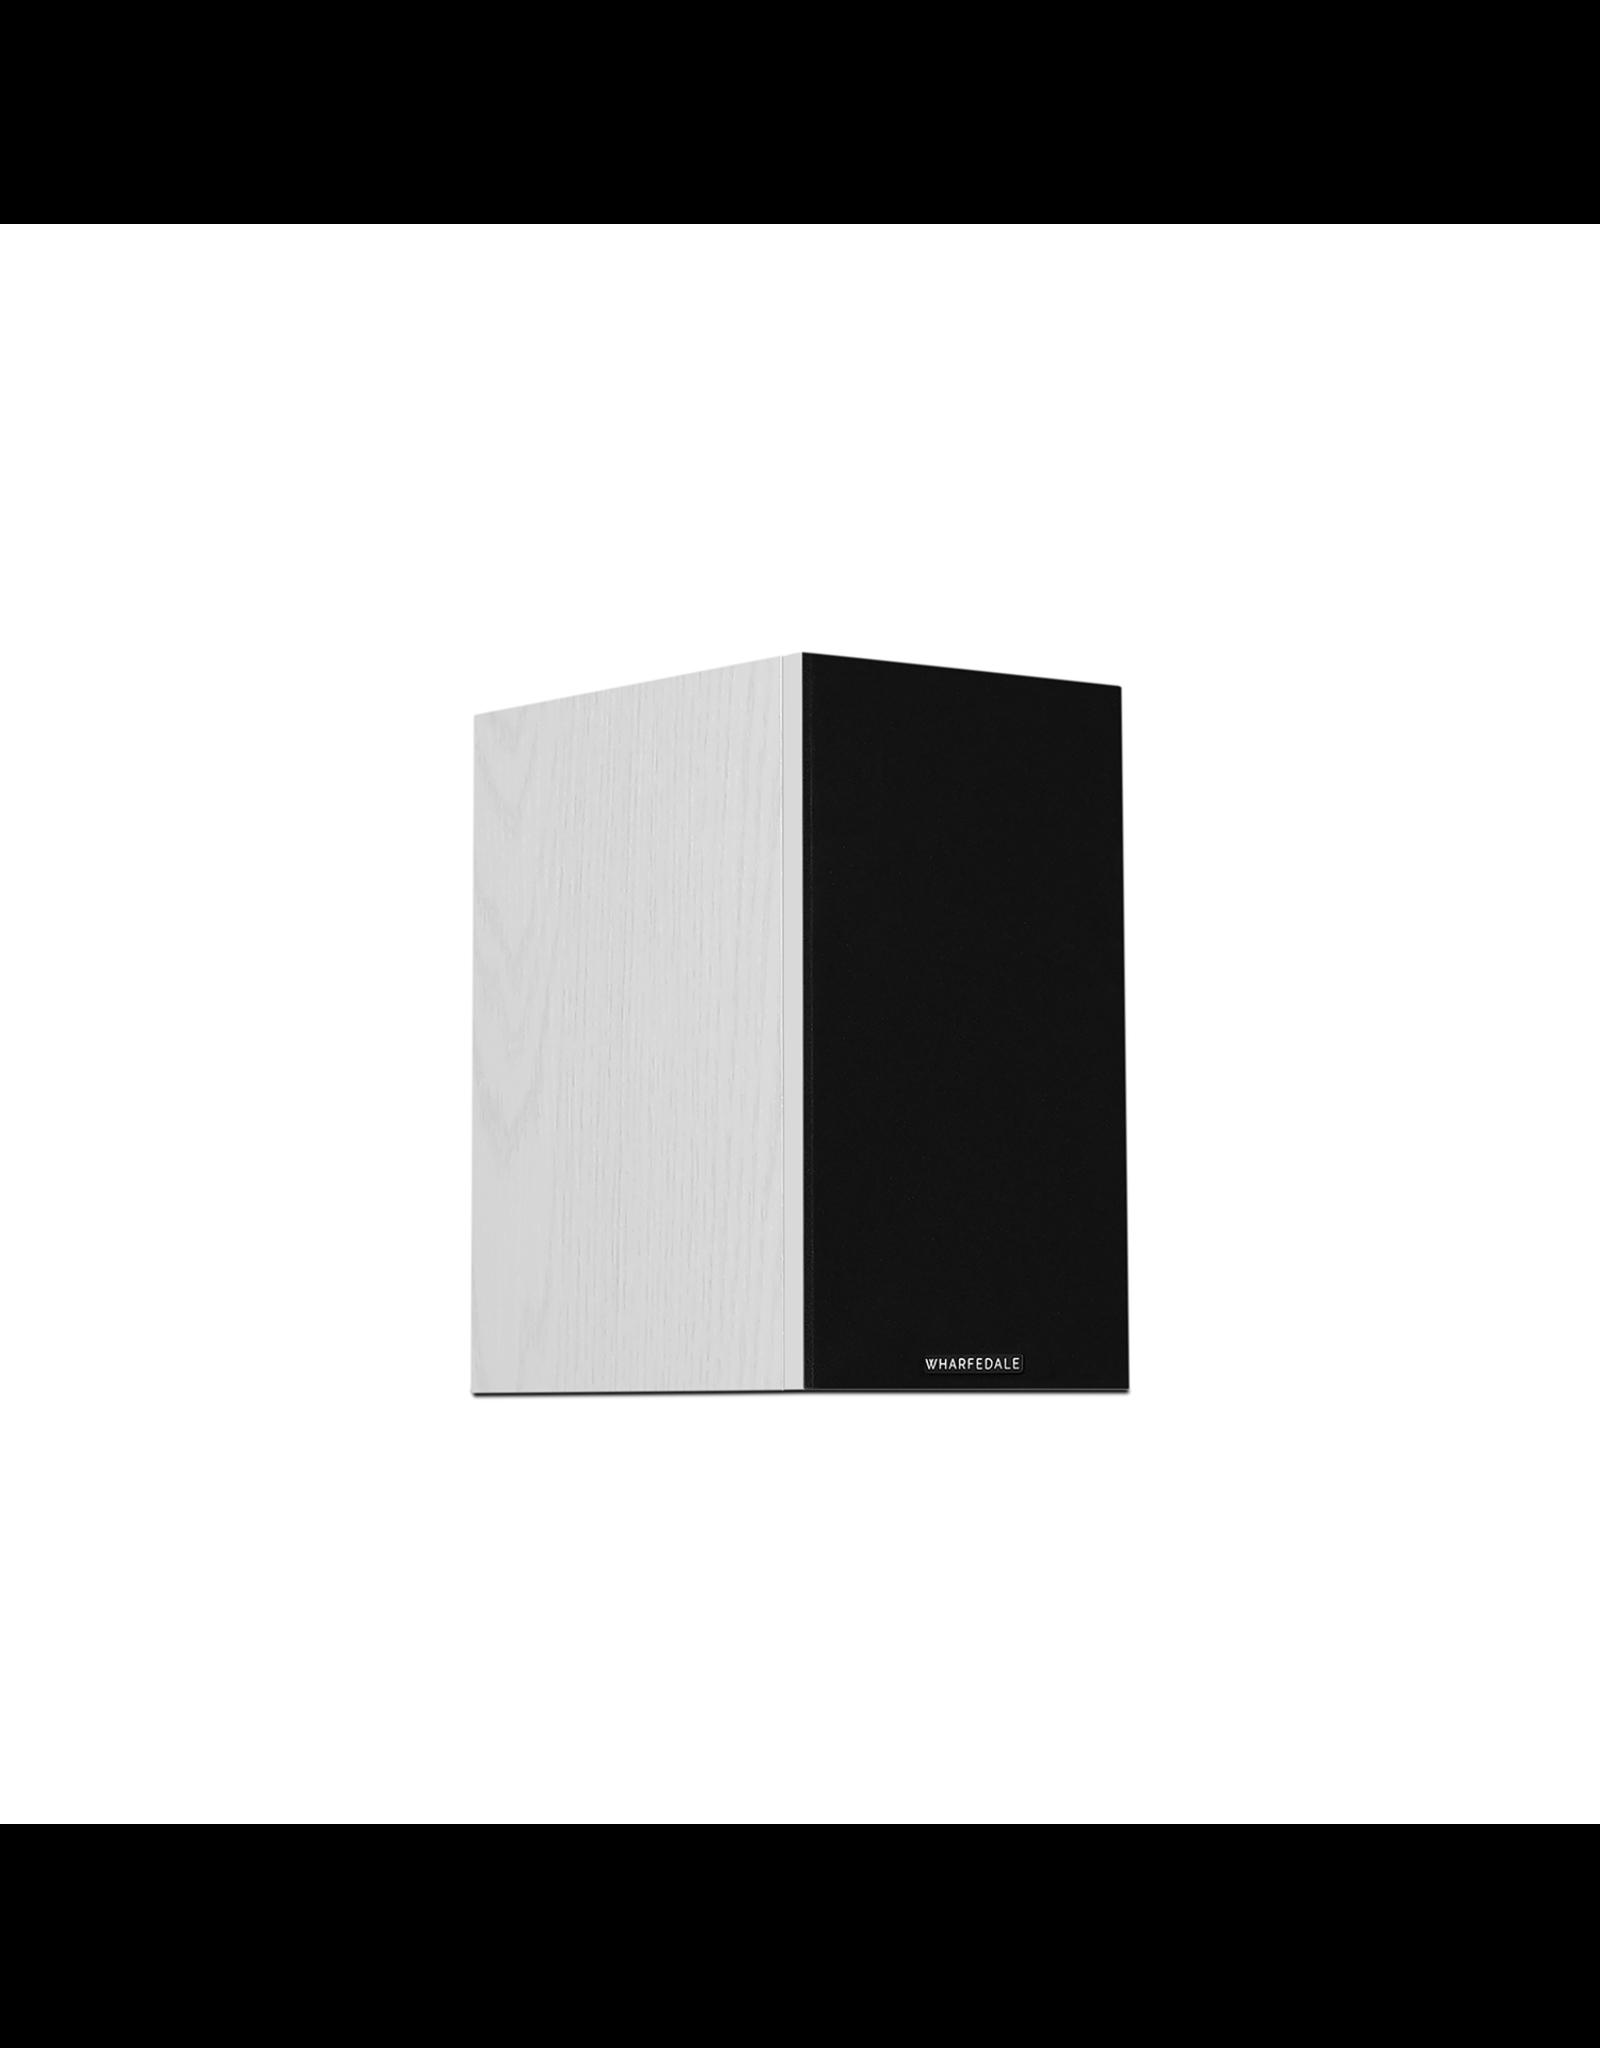 Wharfedale Wharfedale Diamond 12.1 Bookshelf Speakers